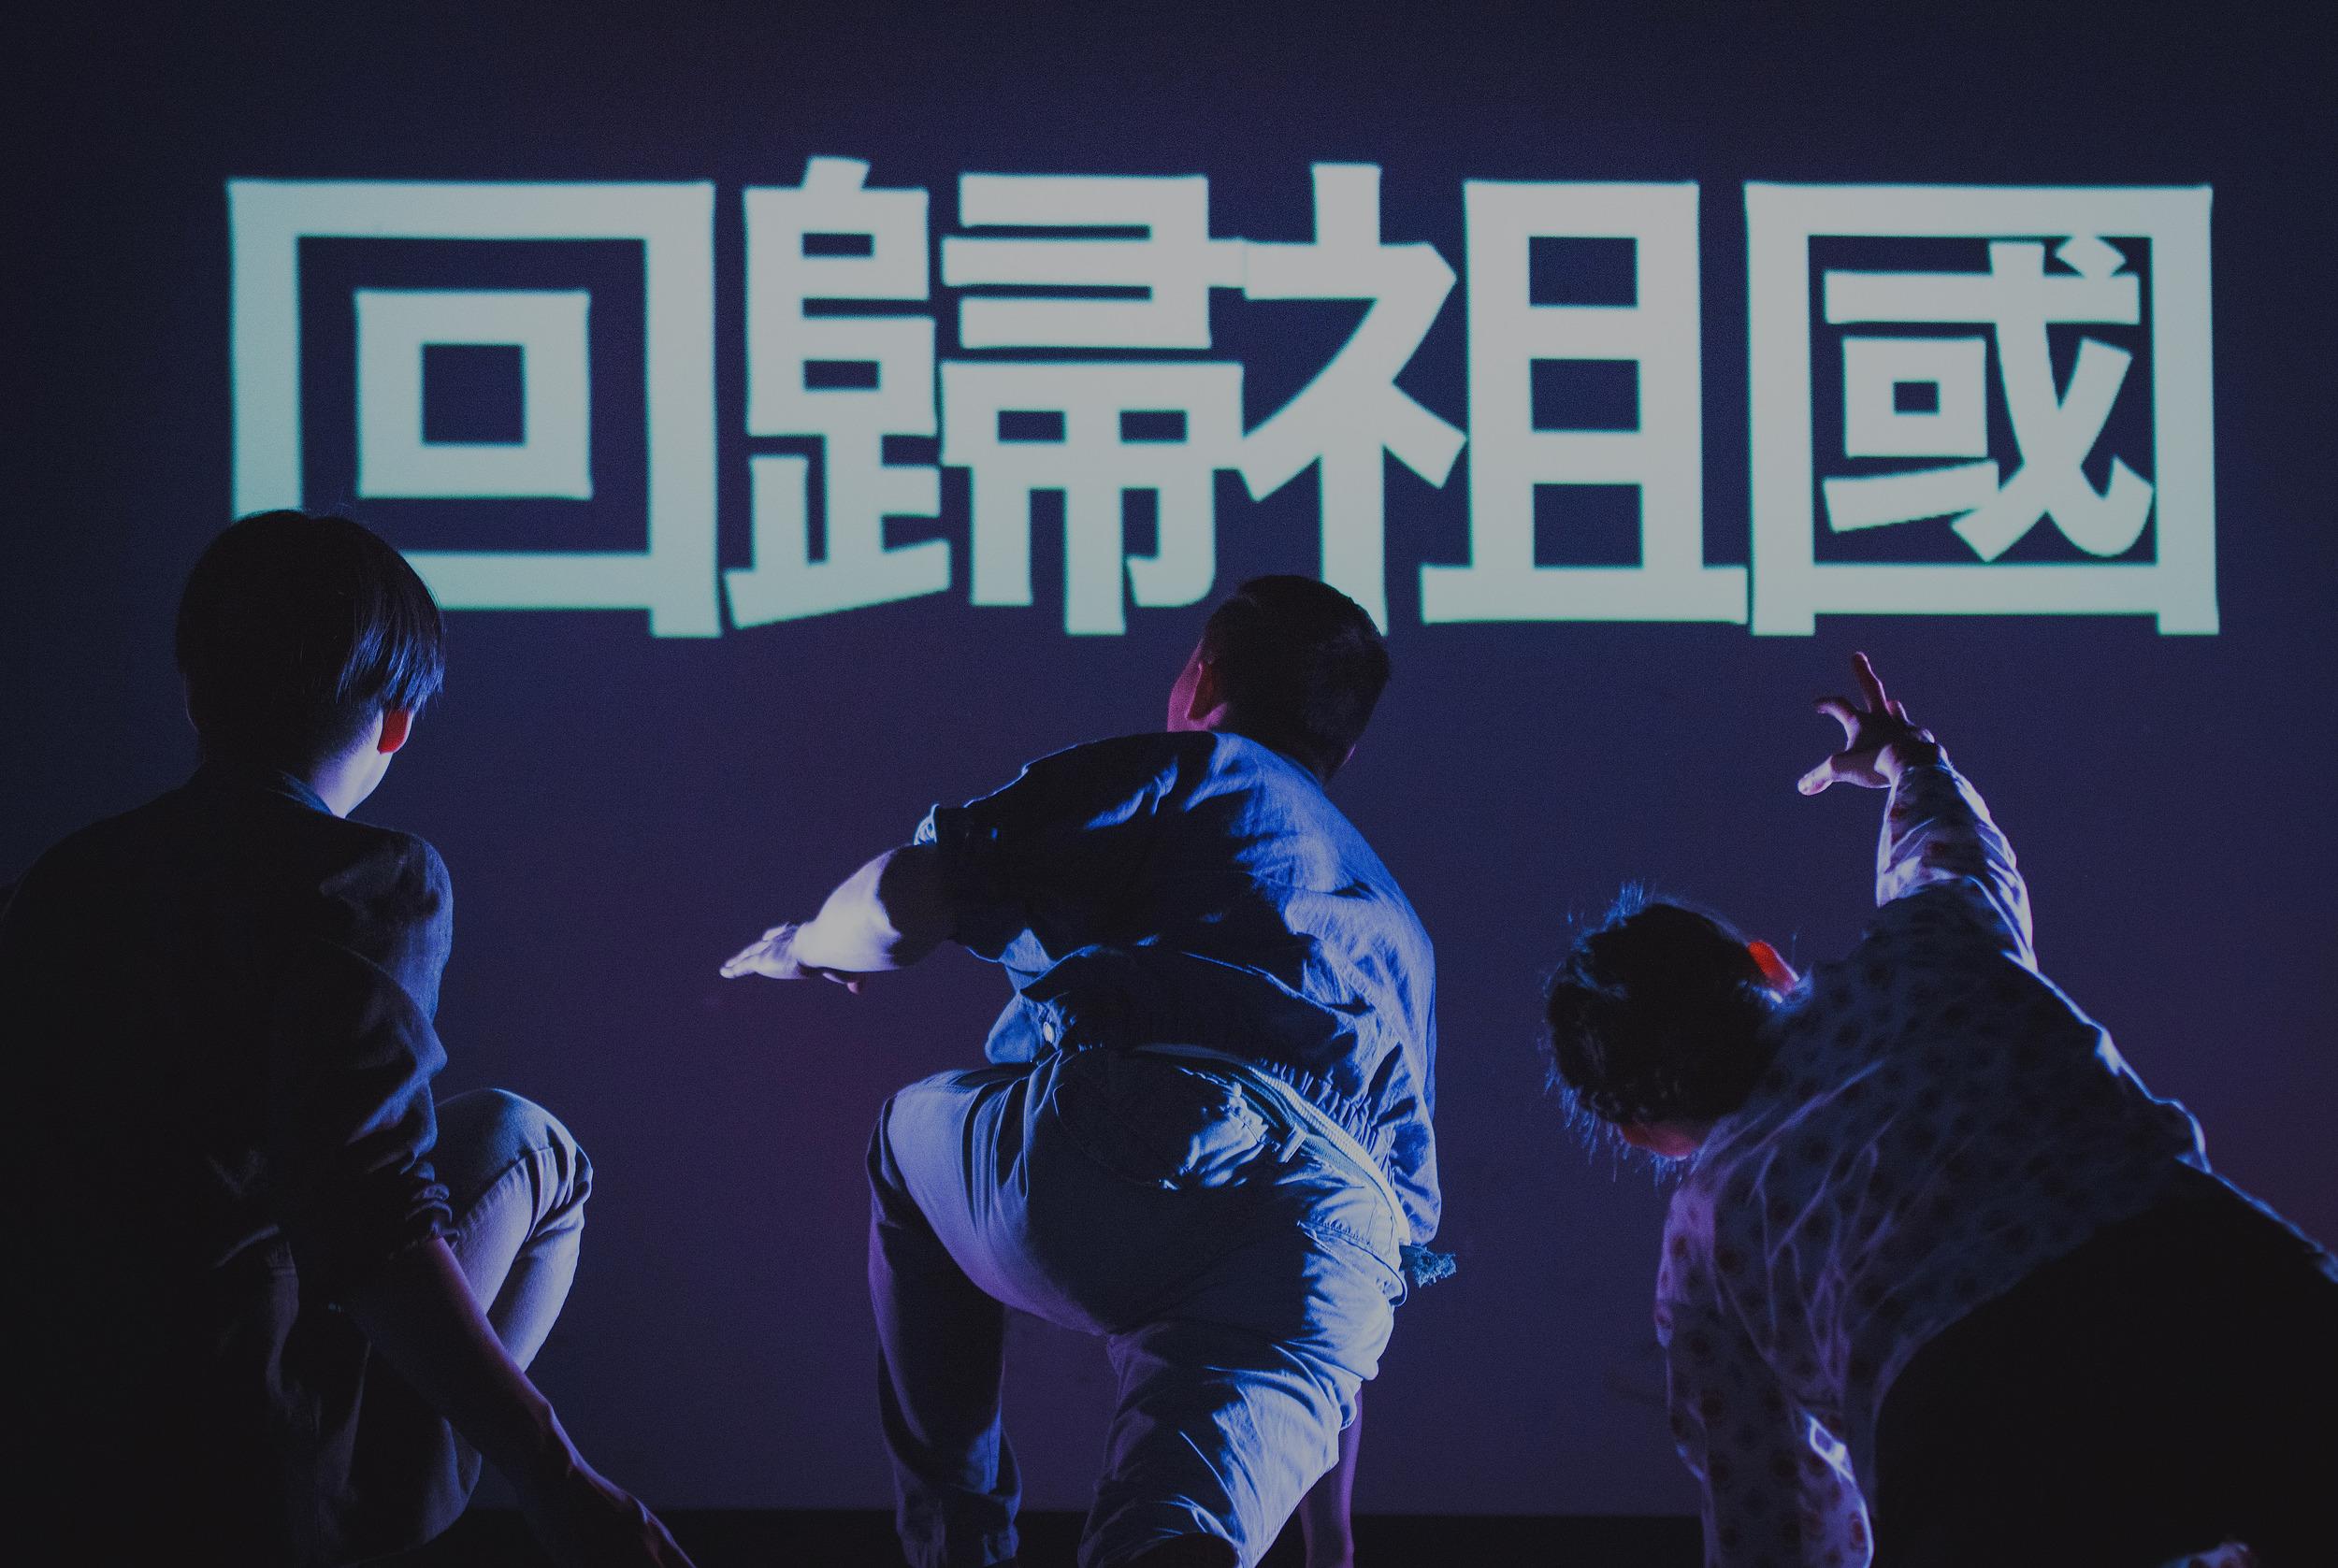 HKX+-+NINEEIGHT+Promotional+Photo+3.jpg